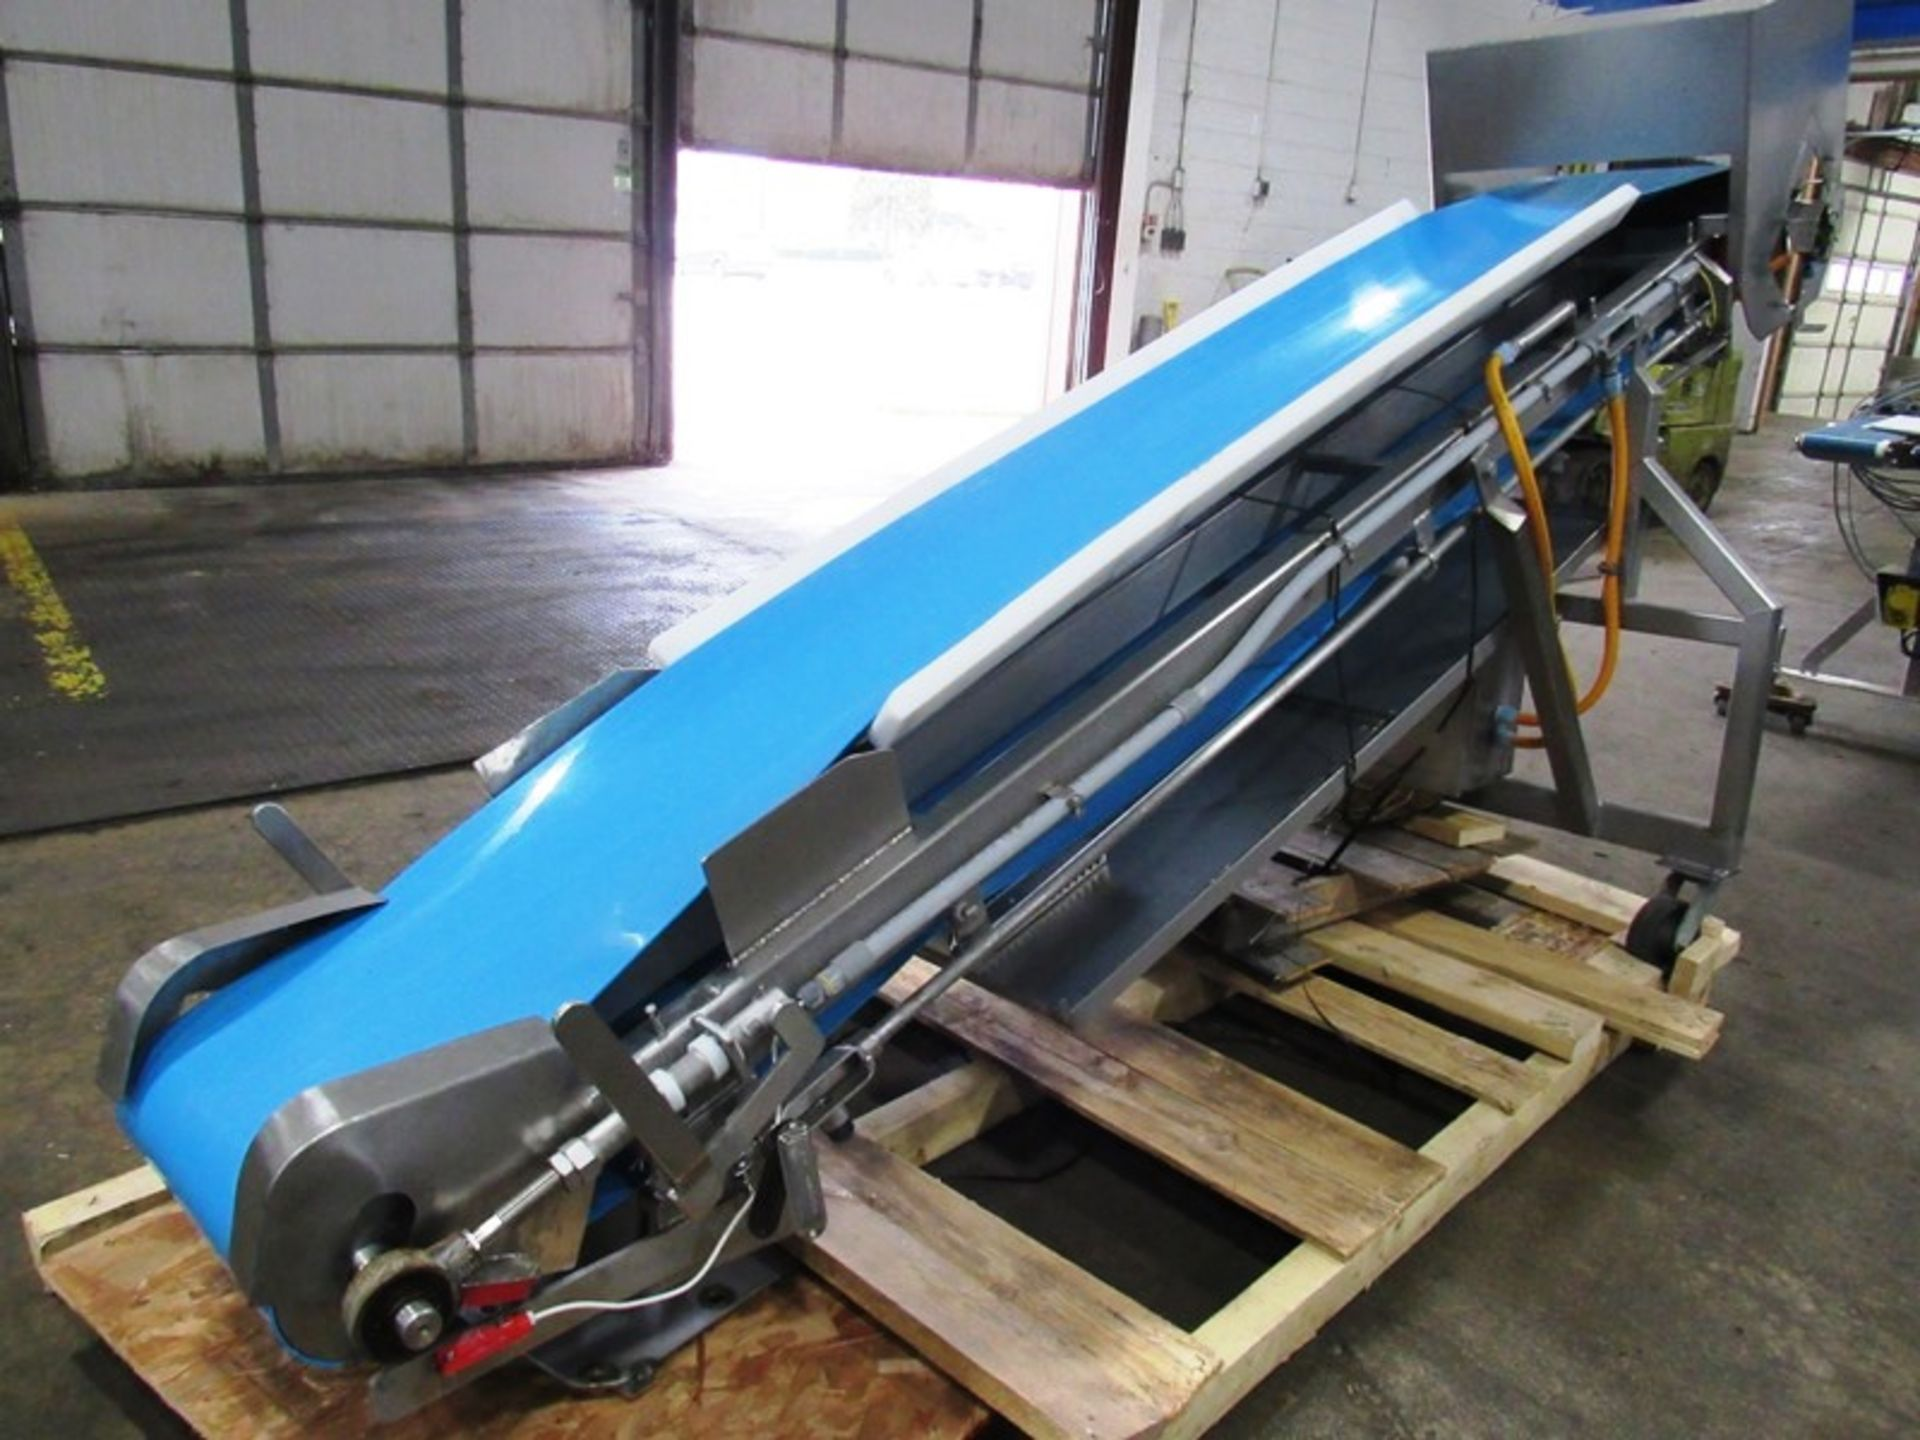 "Stainless Steel Incline Conveyor, 18"" Wide X 11' Long neoprene beltk 12"" inveed, 5' discharge, drum - Image 3 of 5"